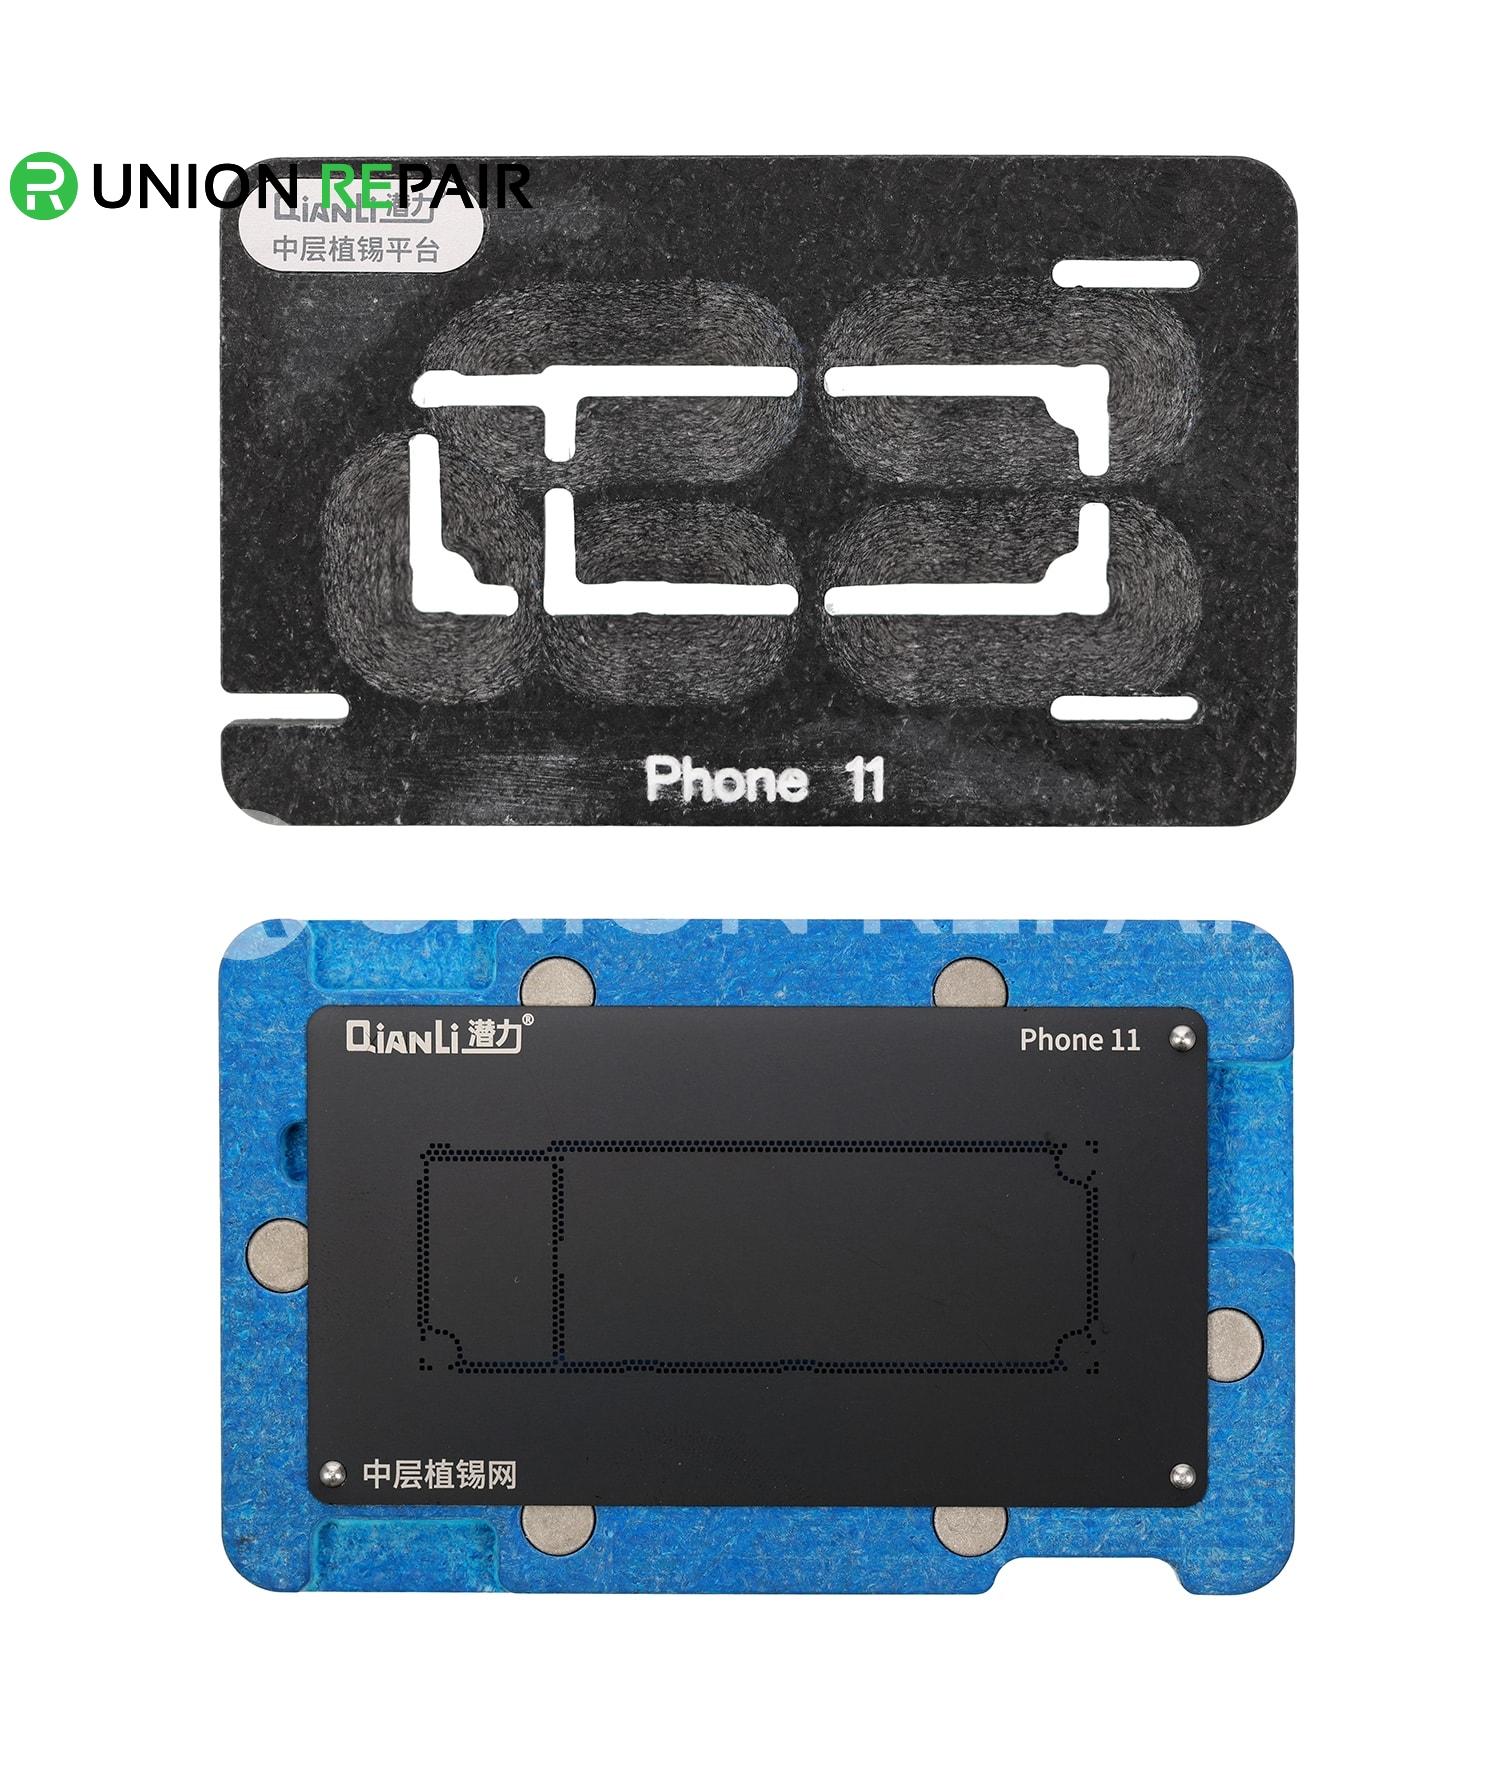 QianLi ToolPlus Middle Frame Reballing Platform for iPhone 11